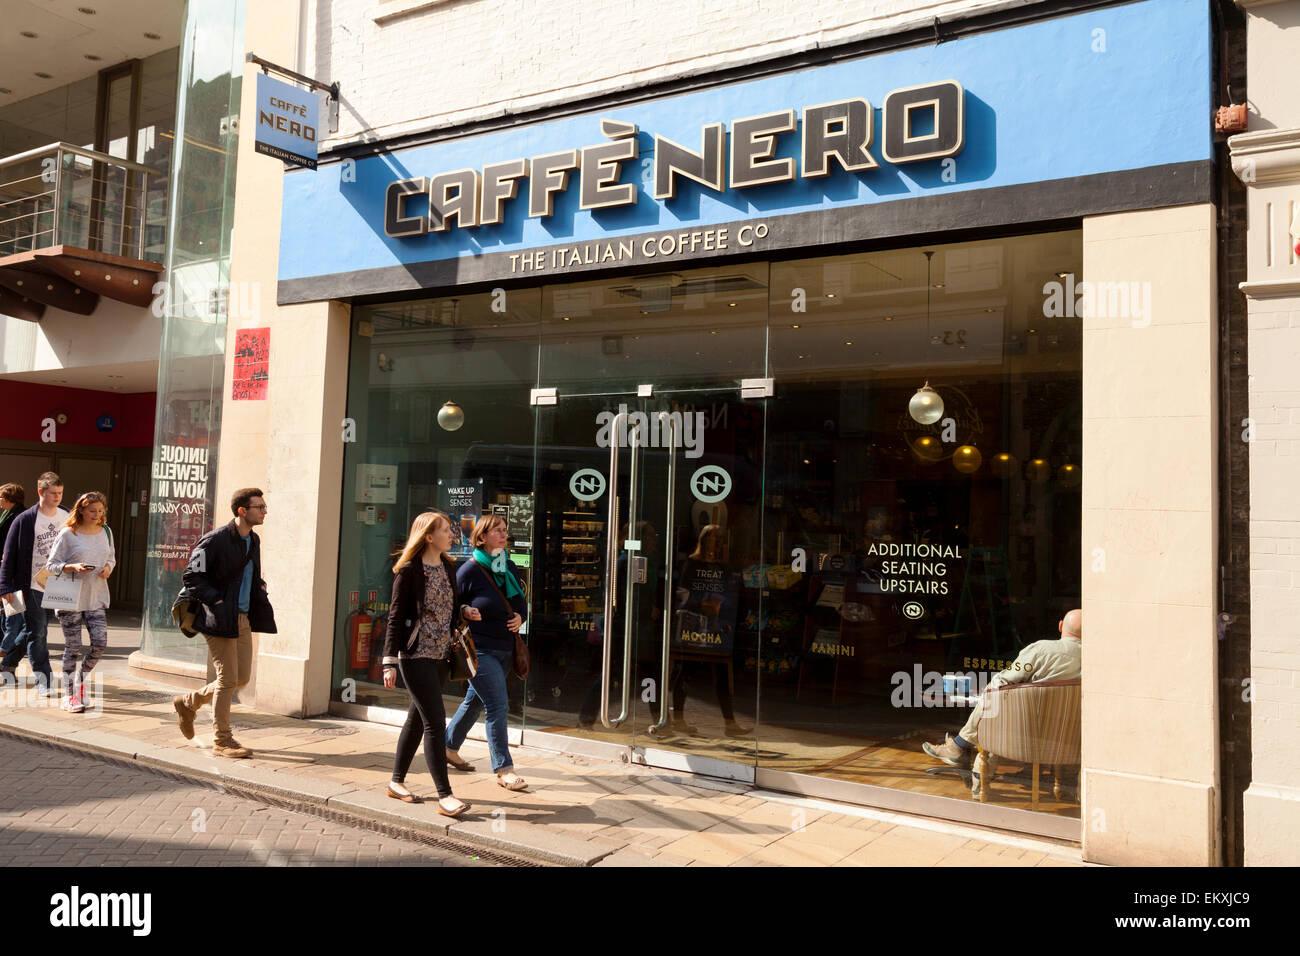 Caffe Nero coffee bar, Church Street, Cambridge branch, England UK - Stock Image